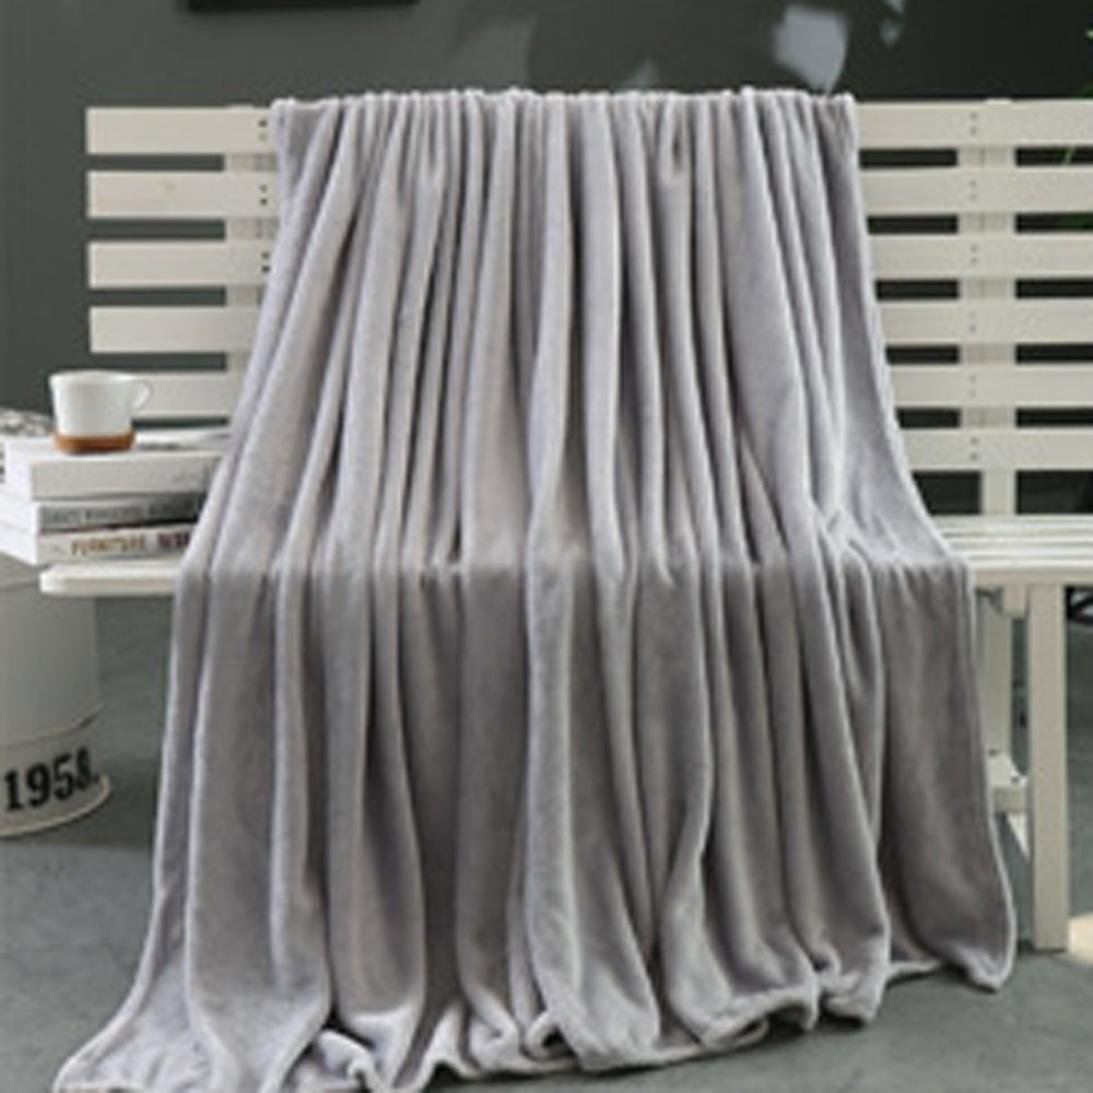 Luxury Fleece Super Soft Thermal Blanket Warm Fuzzy Microplush Lightweight Throw Blankets for Bed Sofa Bedroom Orange 70x100cm//28x40in